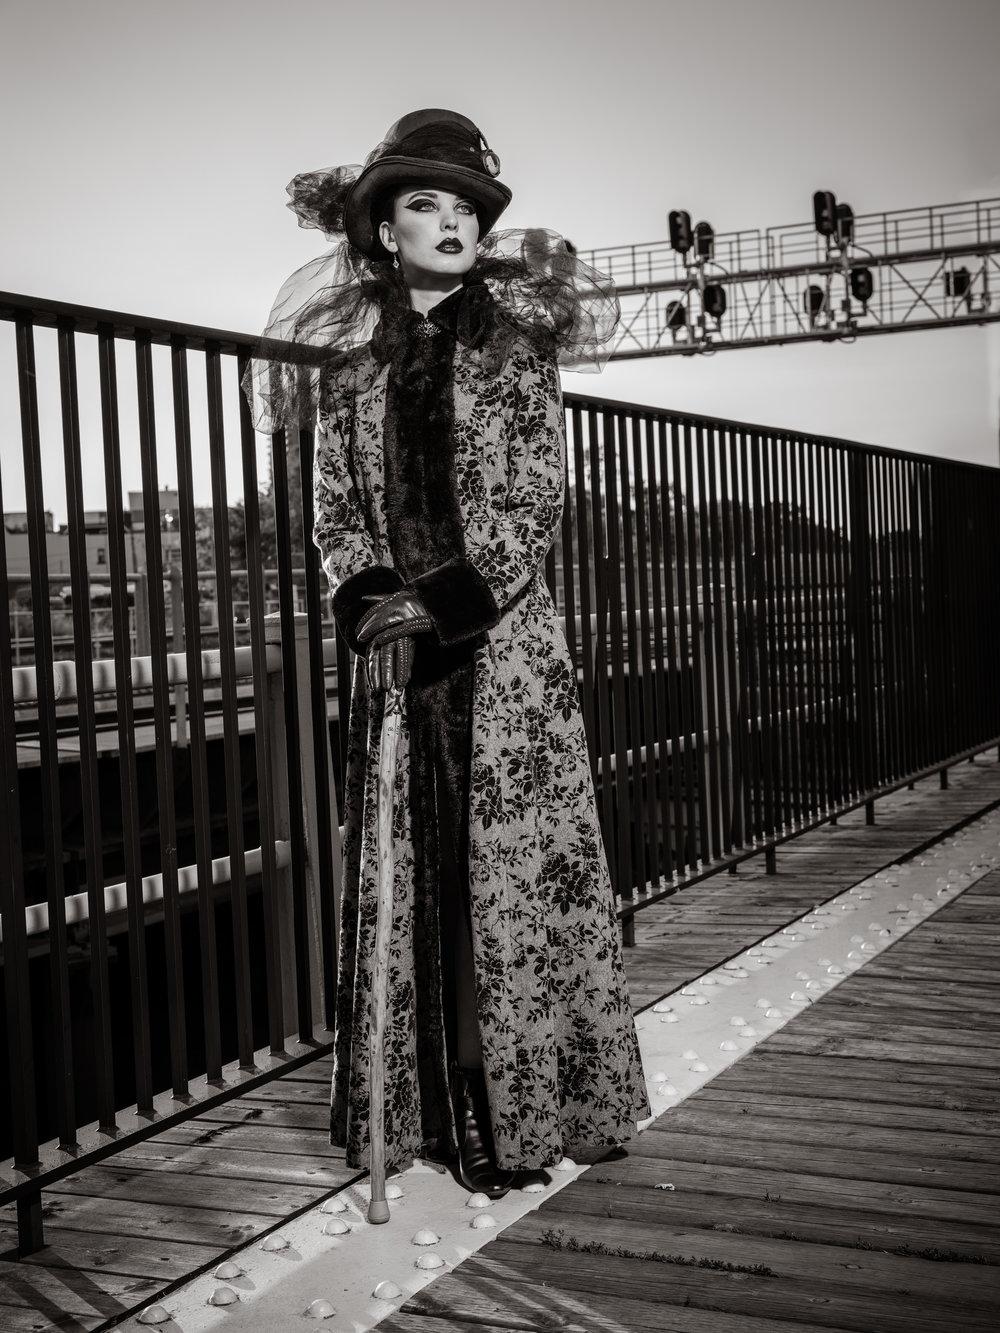 joyKidston_steampunk waiting for the train-002-E-3.jpg